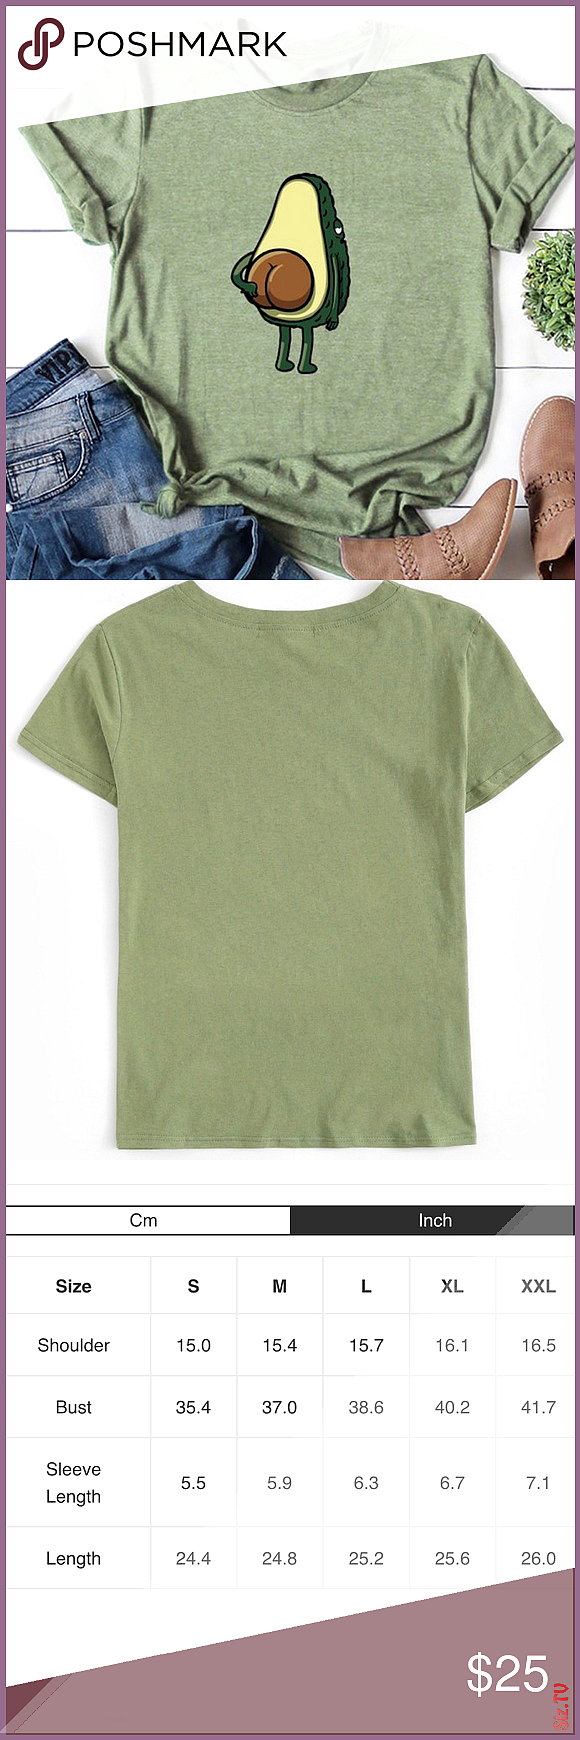 Avocado Graphic Tee   Avocado Cartoon Graphic Tee  100 Cotton  Shirts run smal  Please use measurem